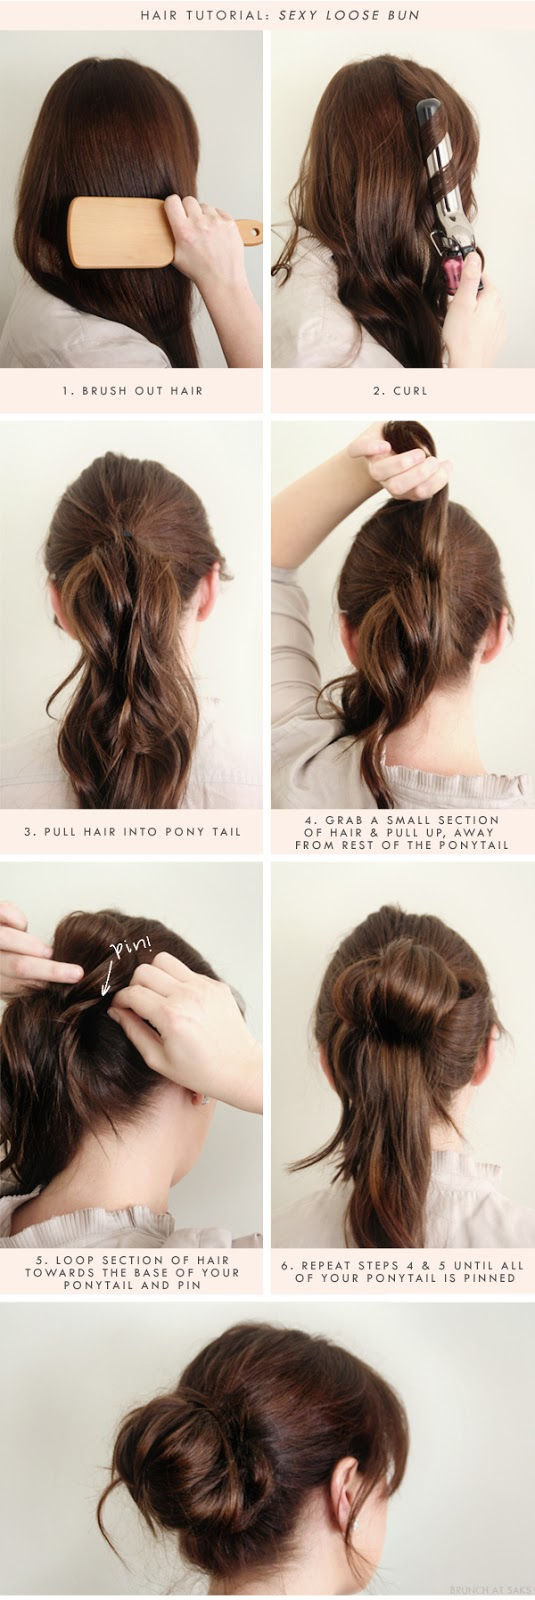 Prime Top 25 Messy Hair Bun Tutorials Perfect For Those Lazy Mornings Short Hairstyles Gunalazisus